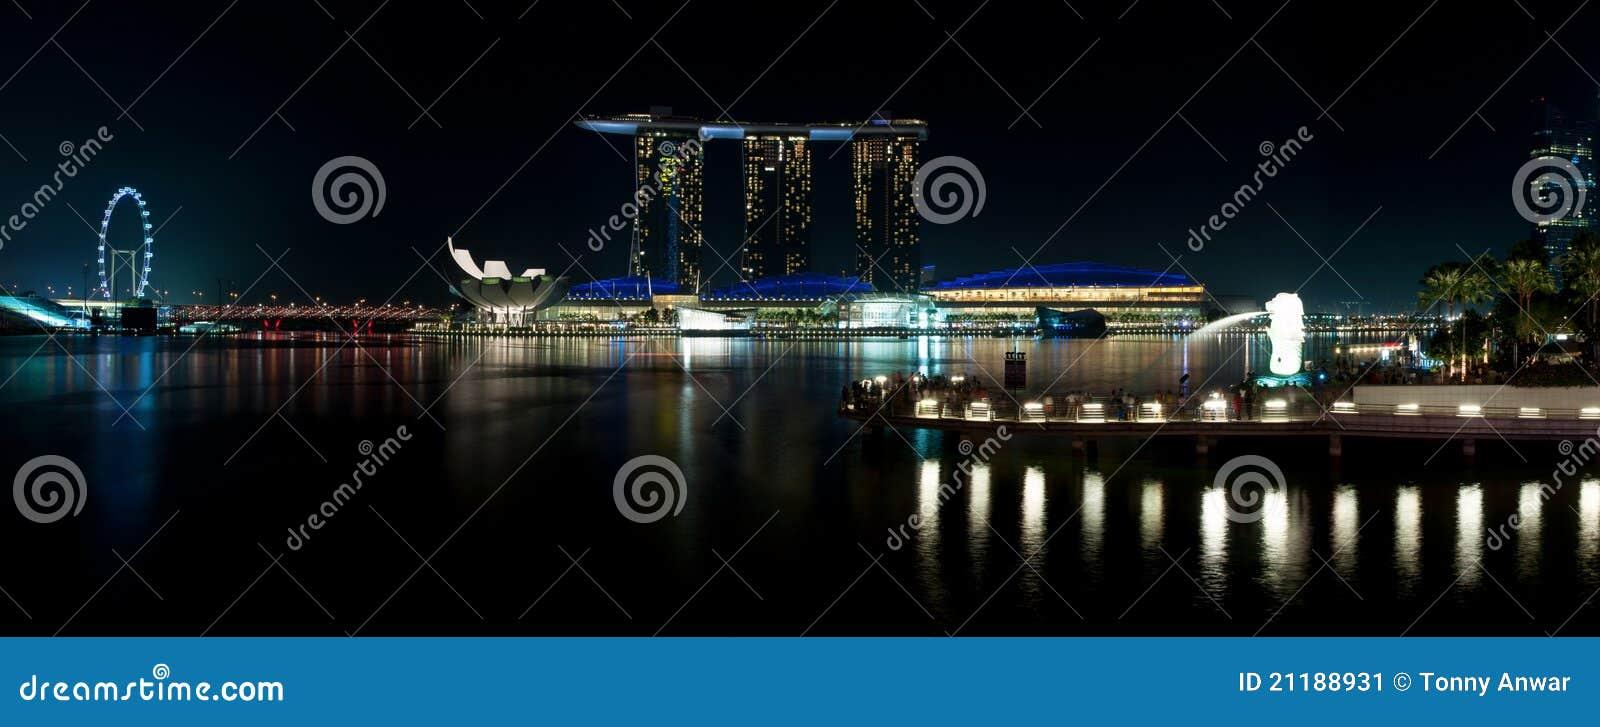 Marina Bay Attraction